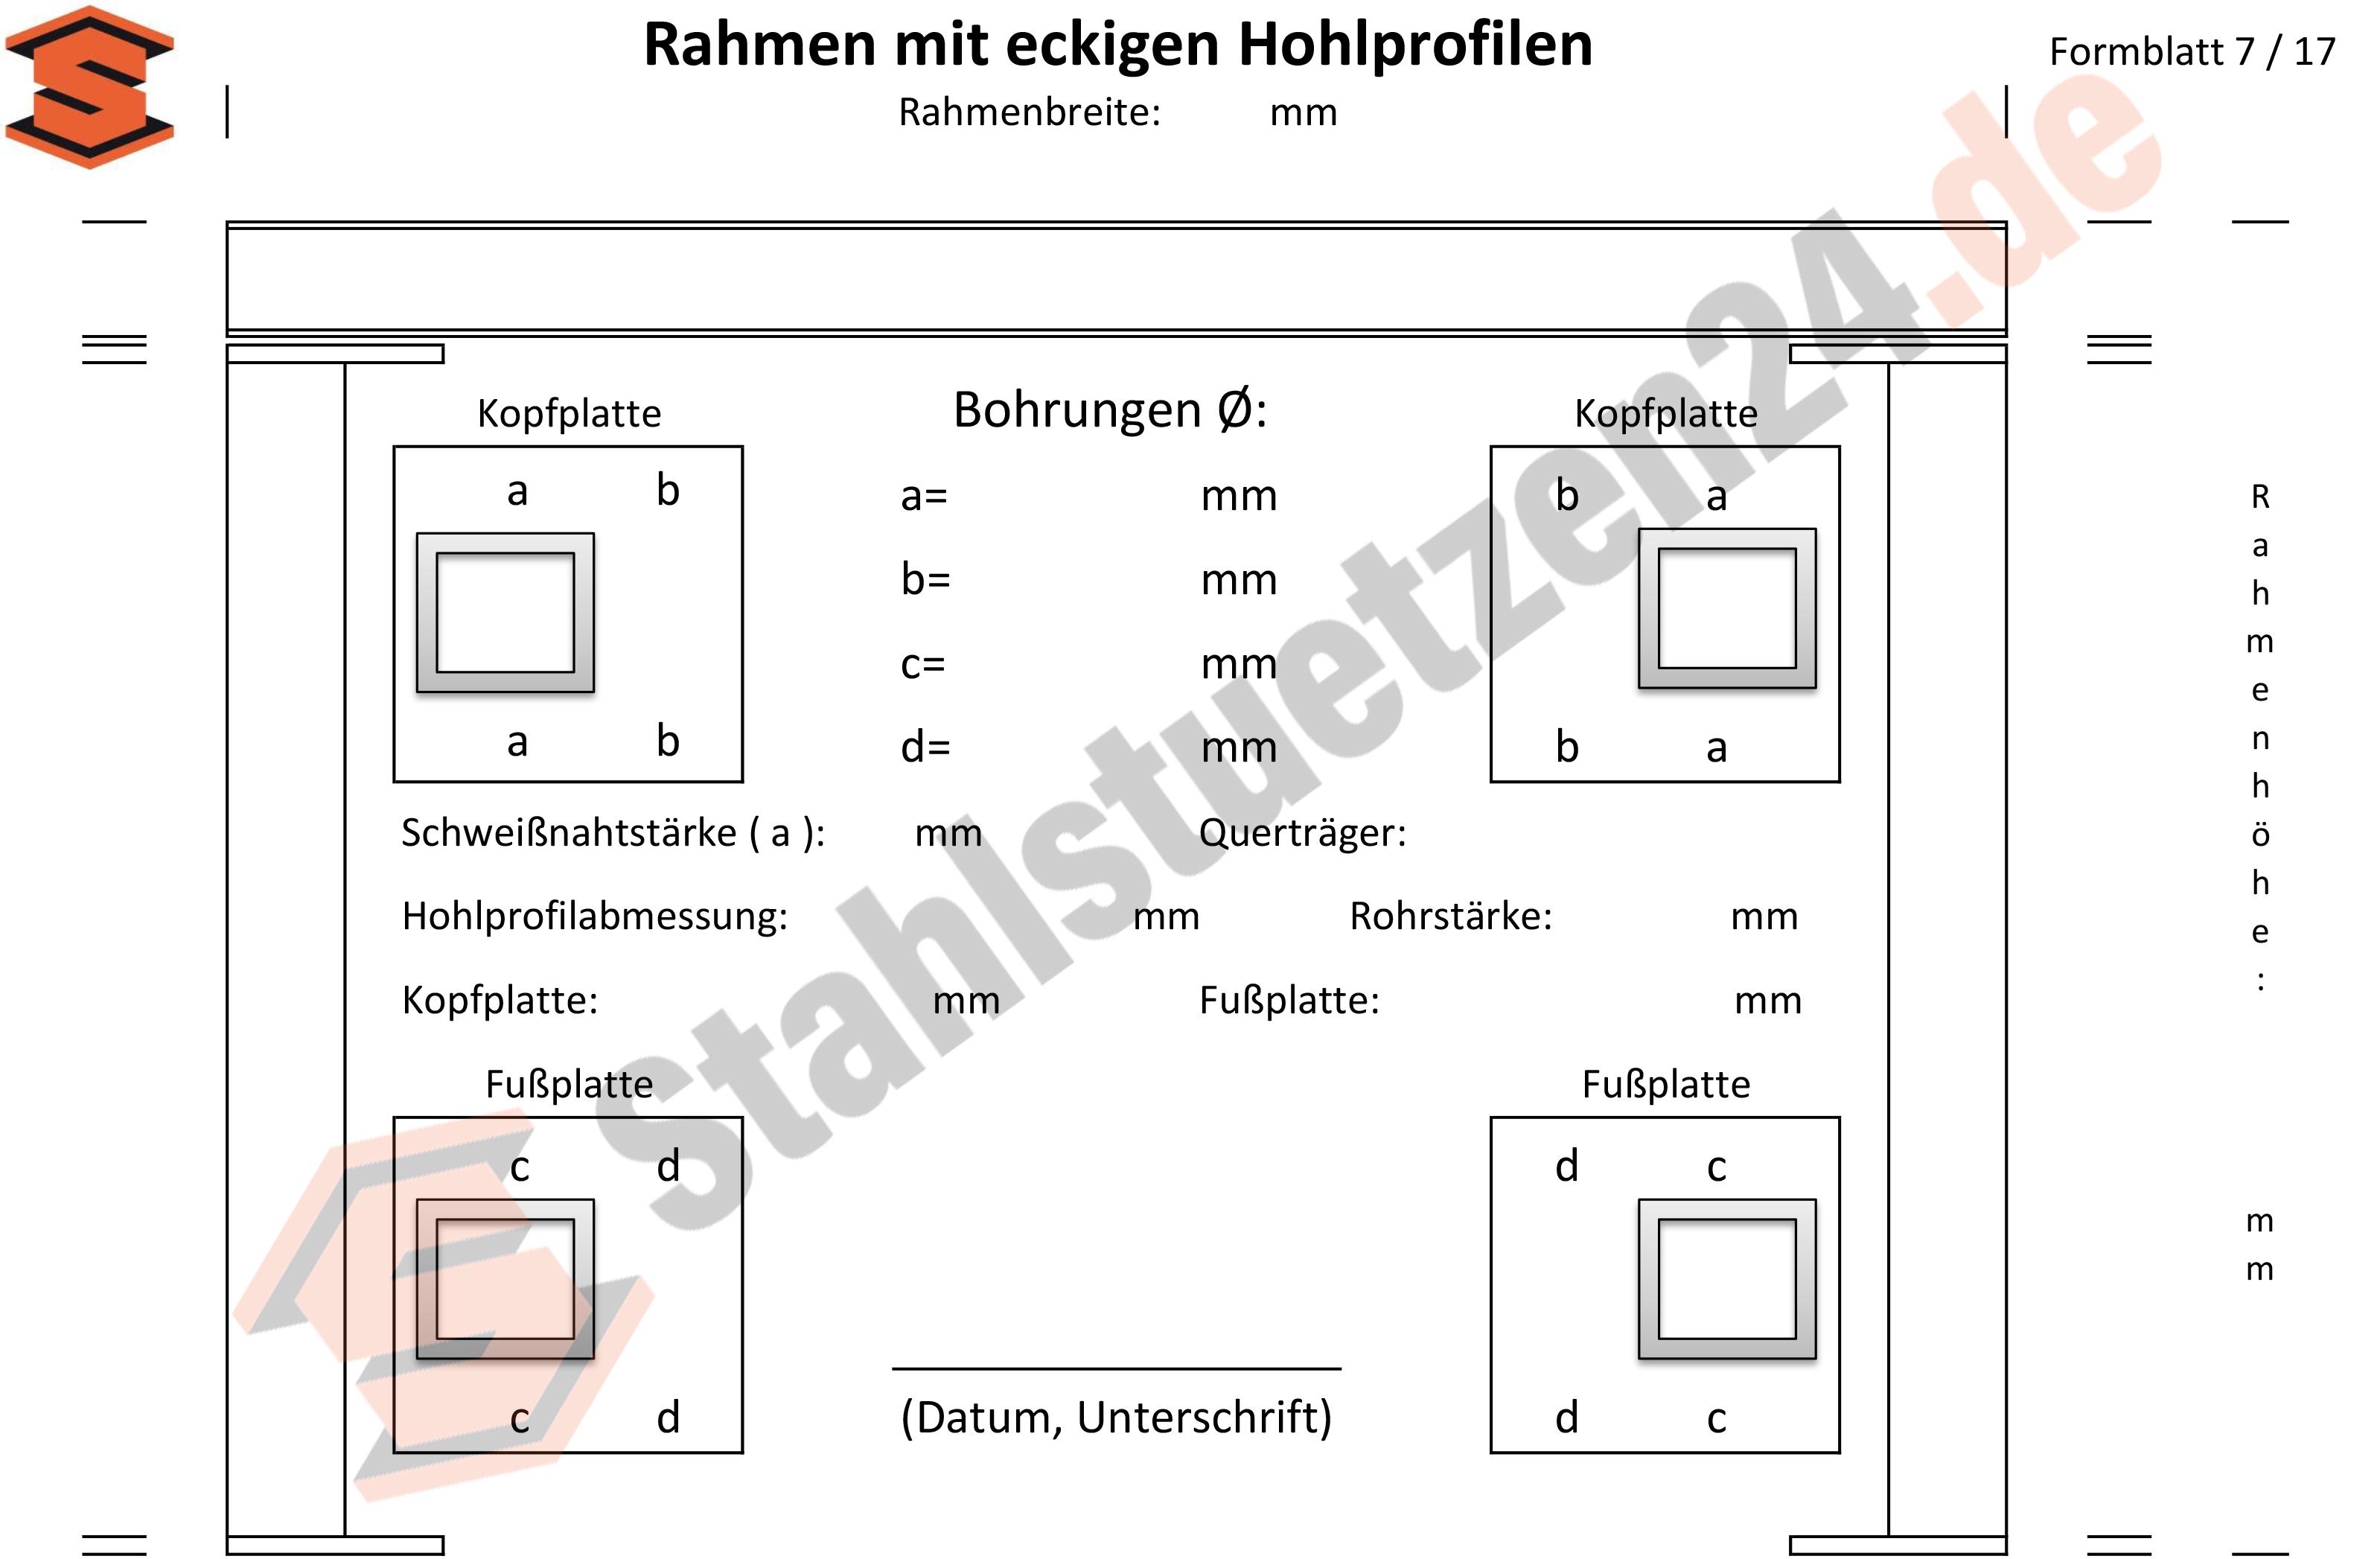 Konstruktionshilfe - Rahmen mit eckigem Hohlprofilen